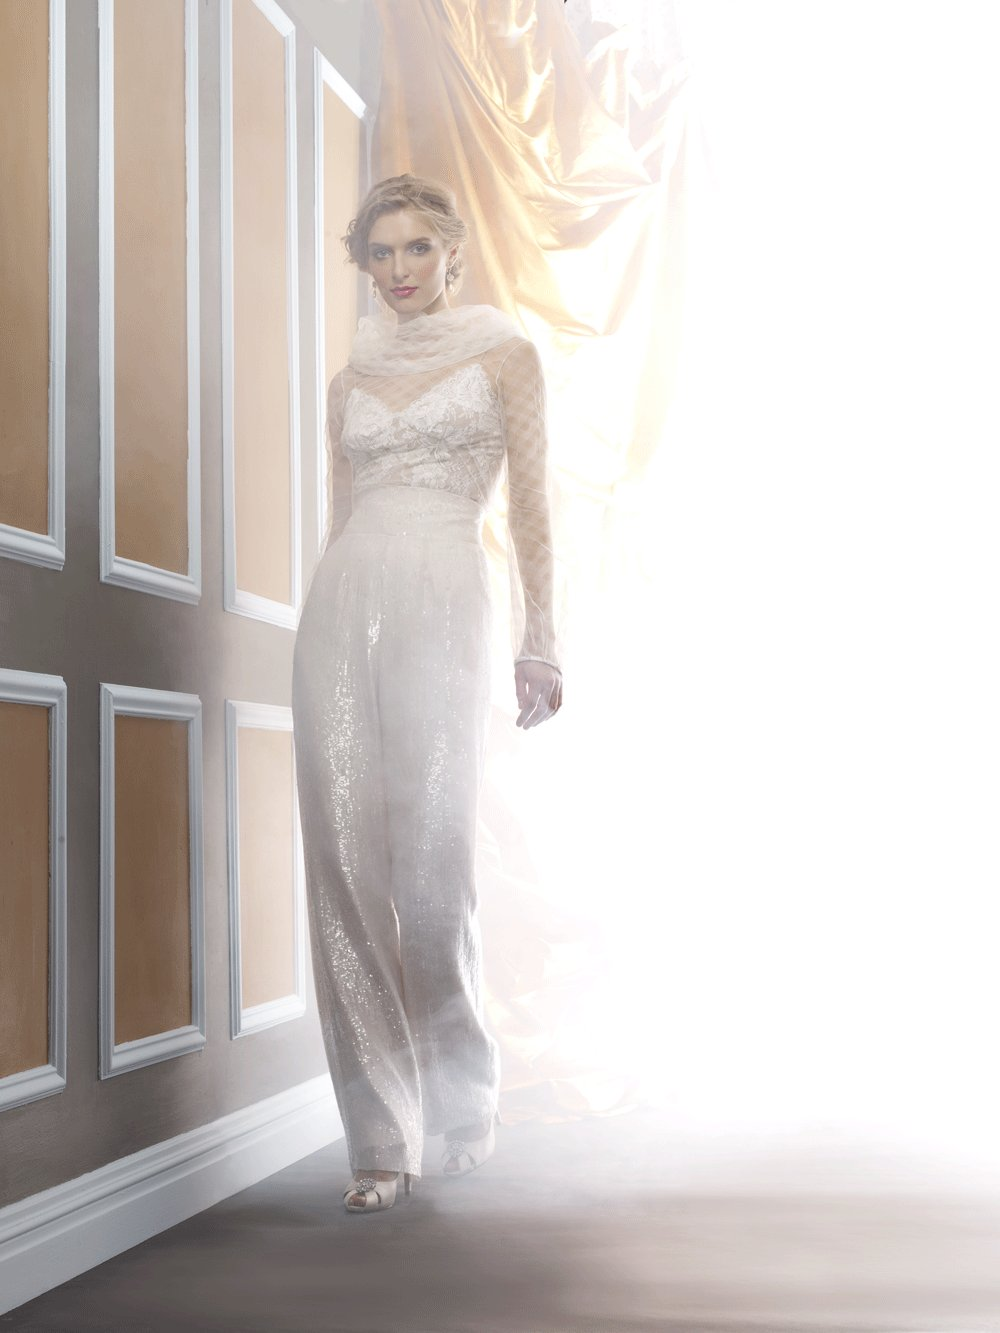 Wedding-dress-by-birnbaum-and-bullock-2013-bridal-liza.full